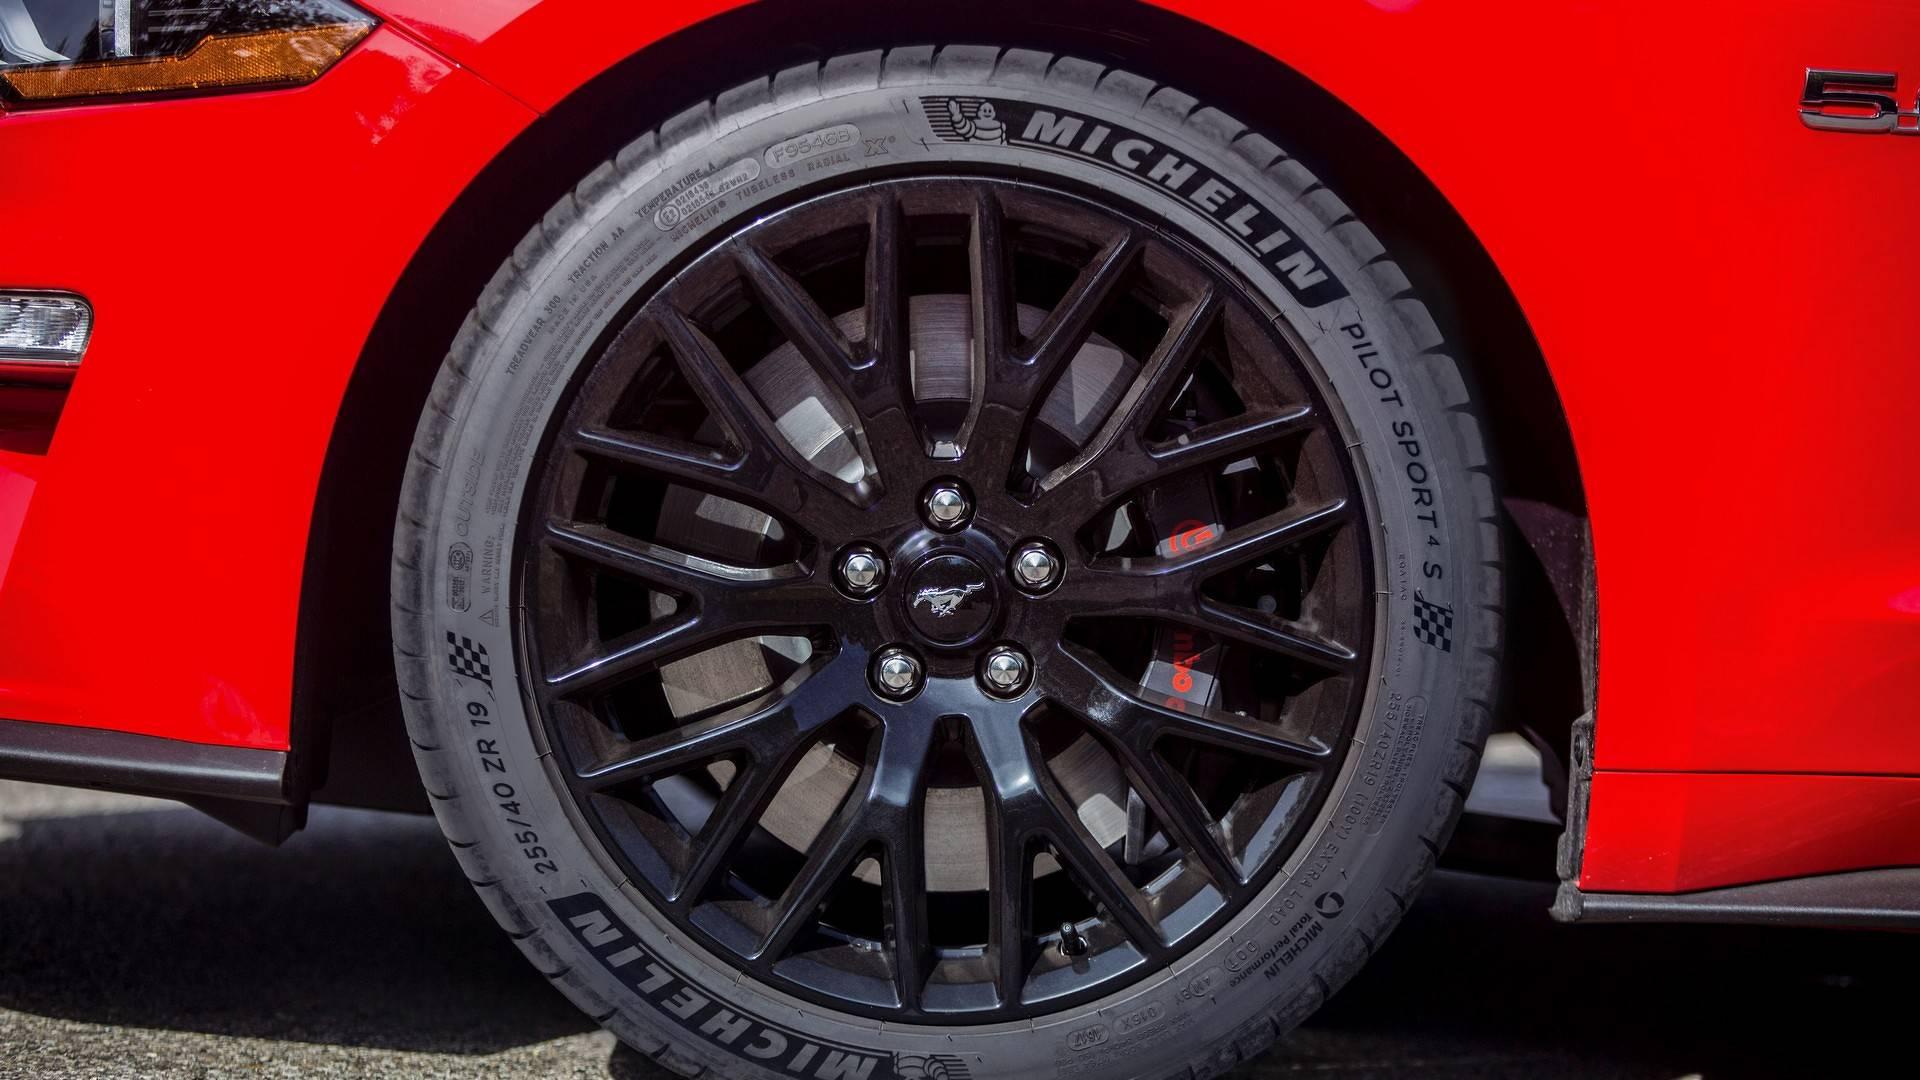 2018 ford mustang gt gets michelin pilot sport 4s rubber. Black Bedroom Furniture Sets. Home Design Ideas